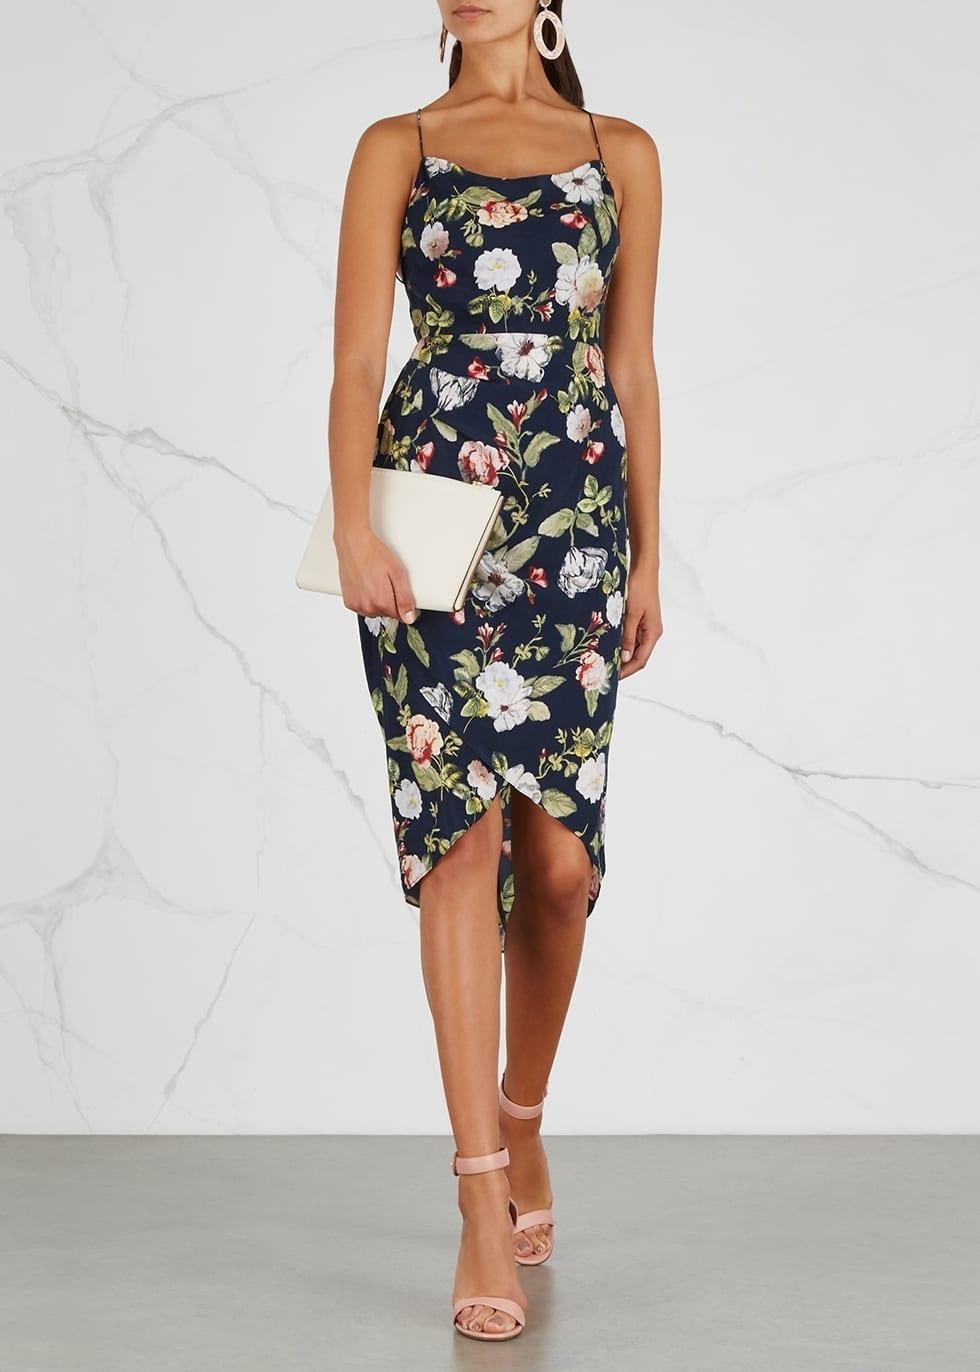 79c9fd85f9aa3 ALICE + OLIVIA Reena Satin Midi Navy / Floral Printed Dress - We ...